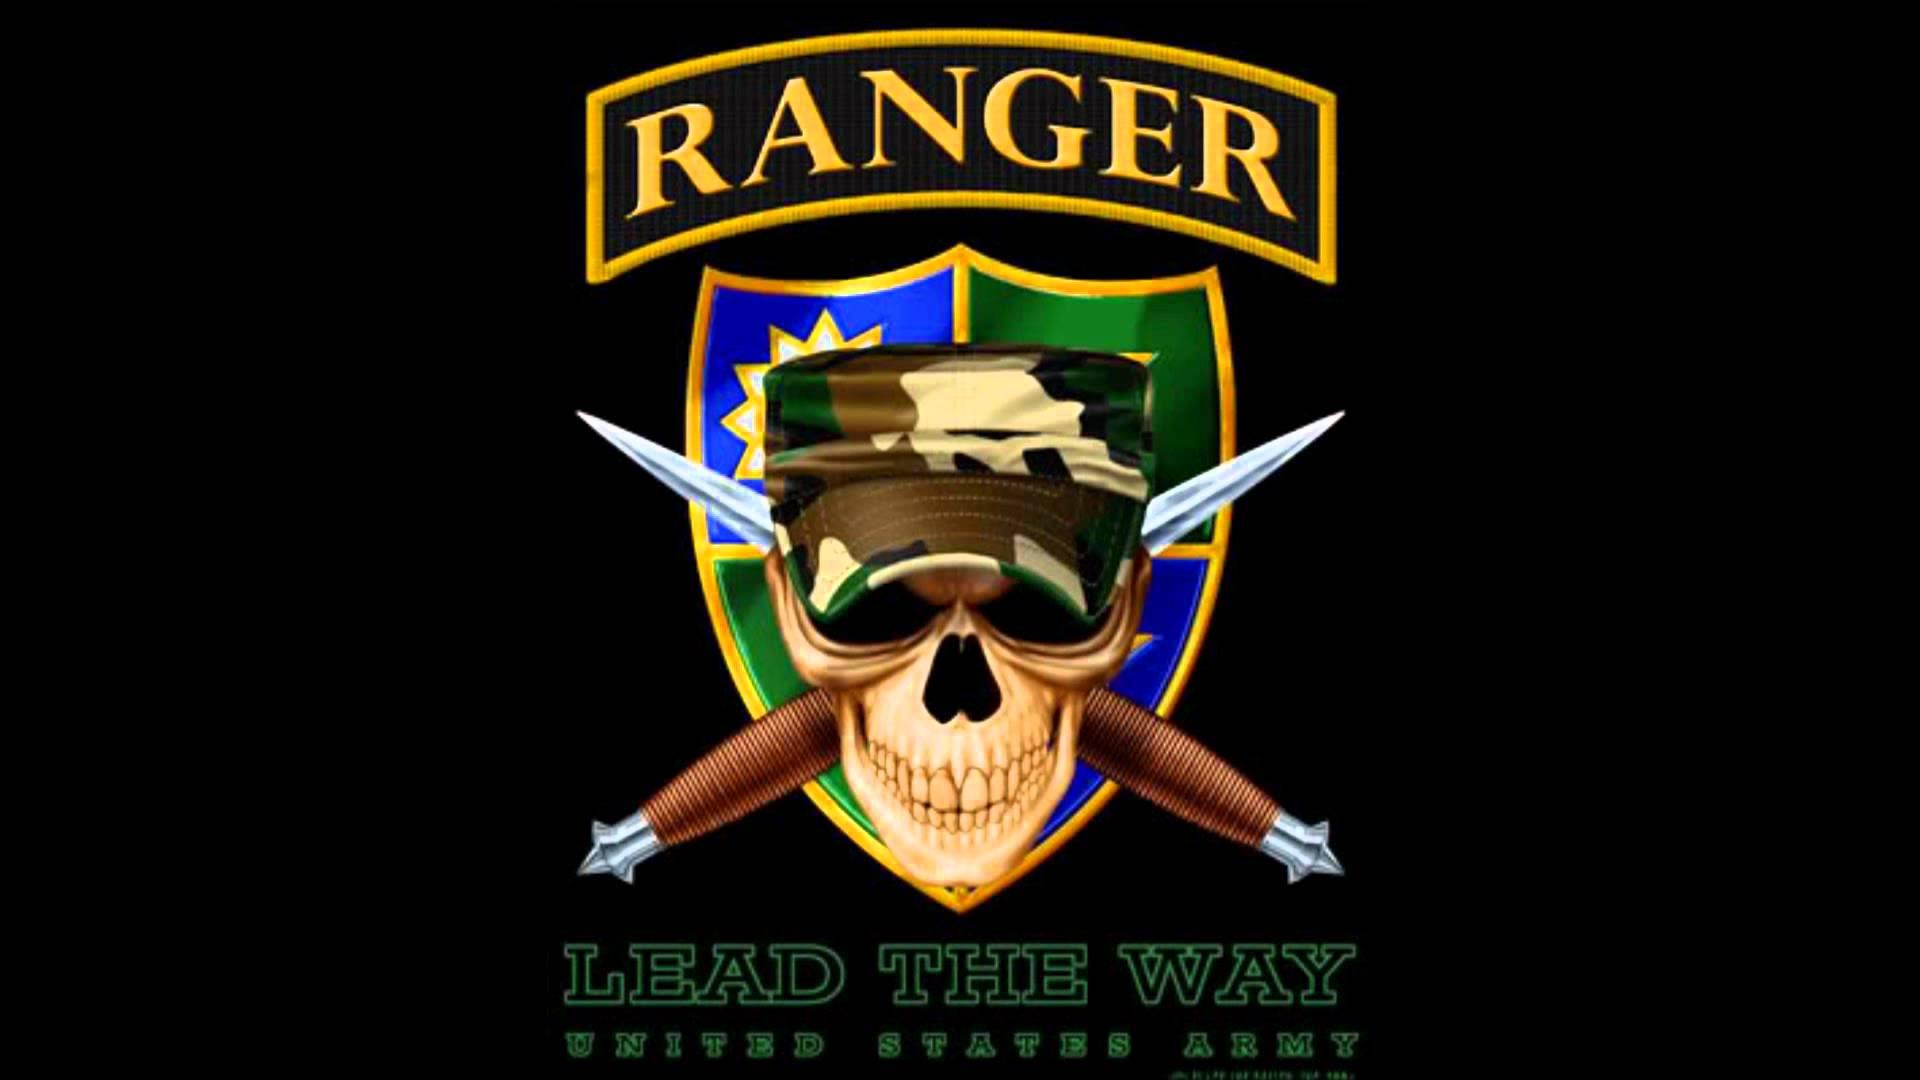 Us army ranger hd wallpaper 1920x1080